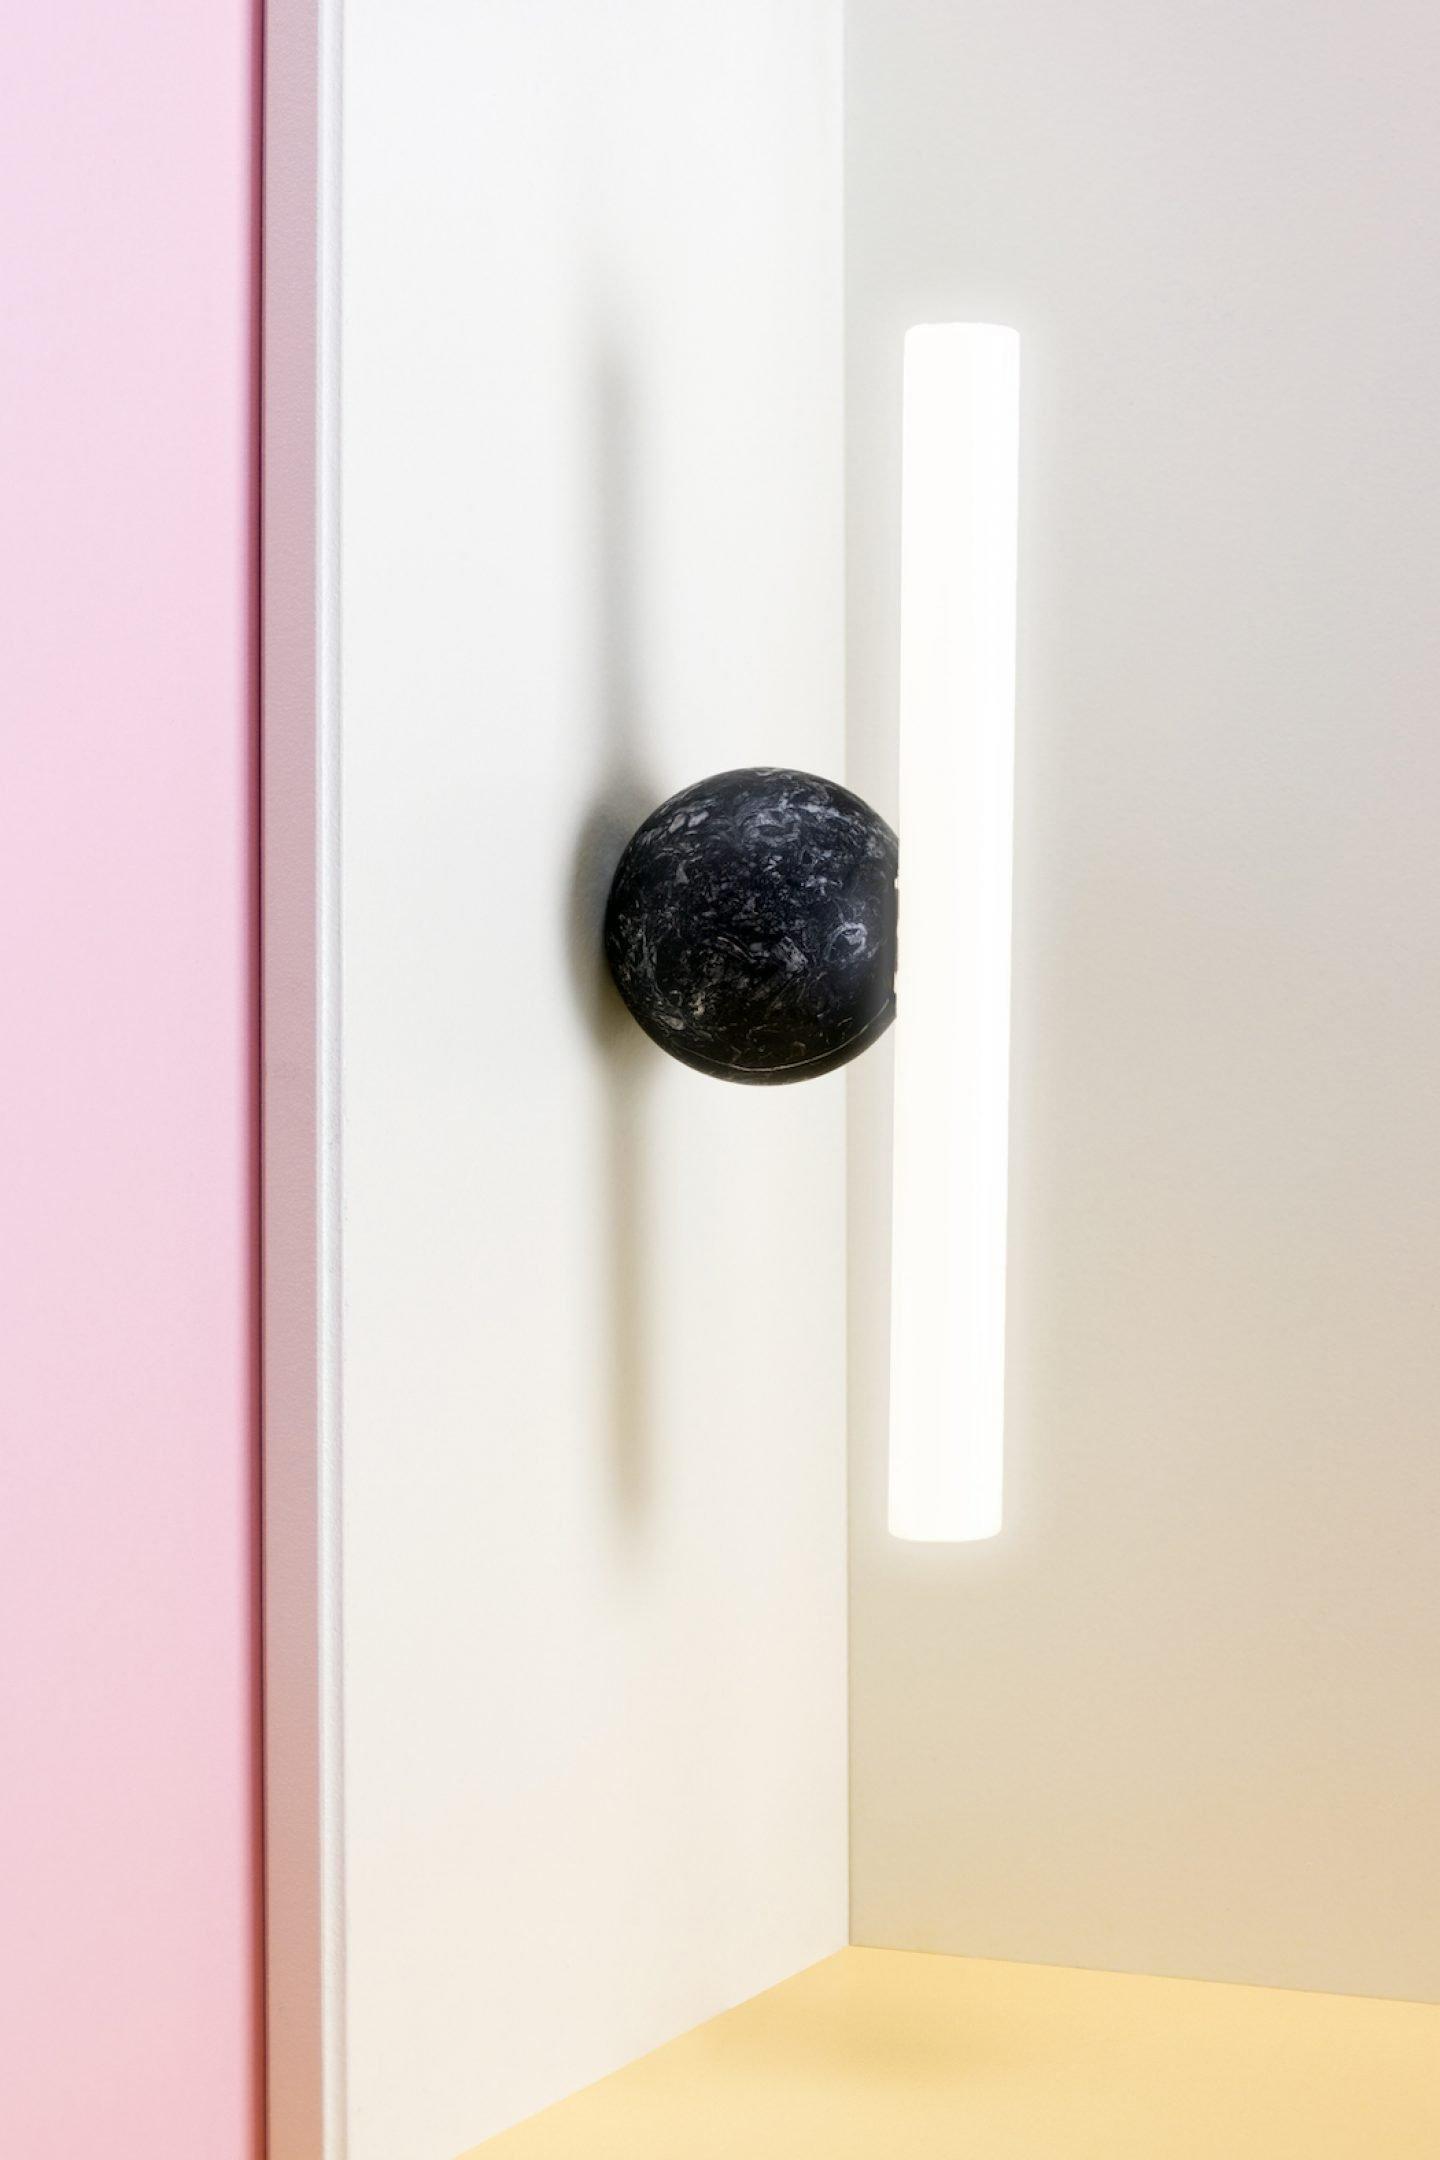 THEVOZ_CHOQUET_Design_murale_noire